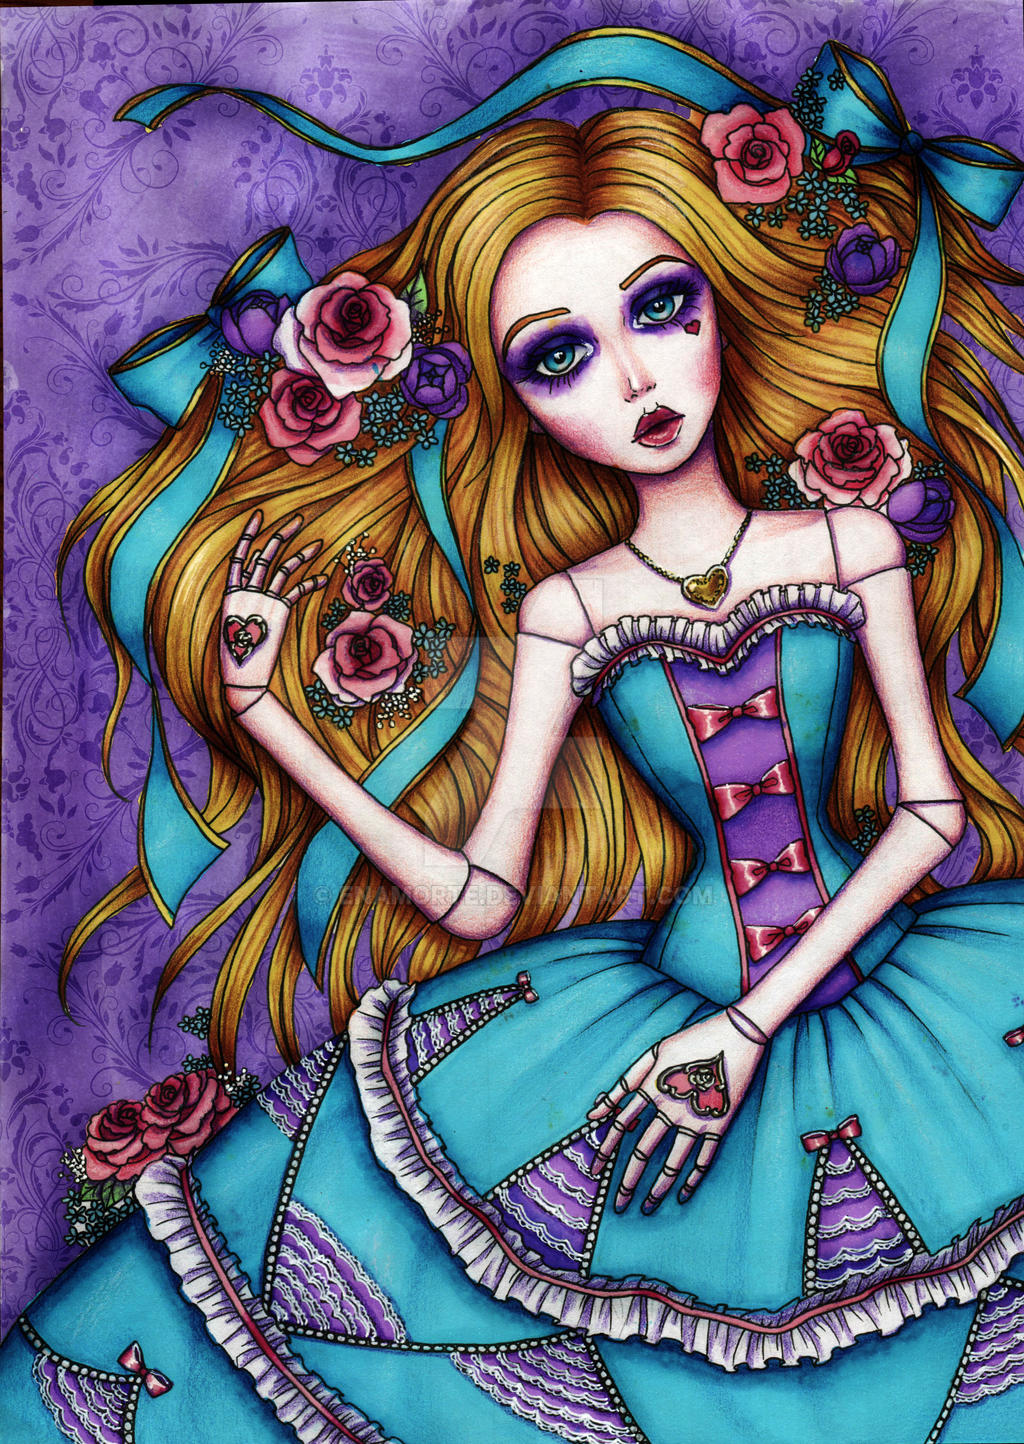 girly stuff pt 2 by Enamorte